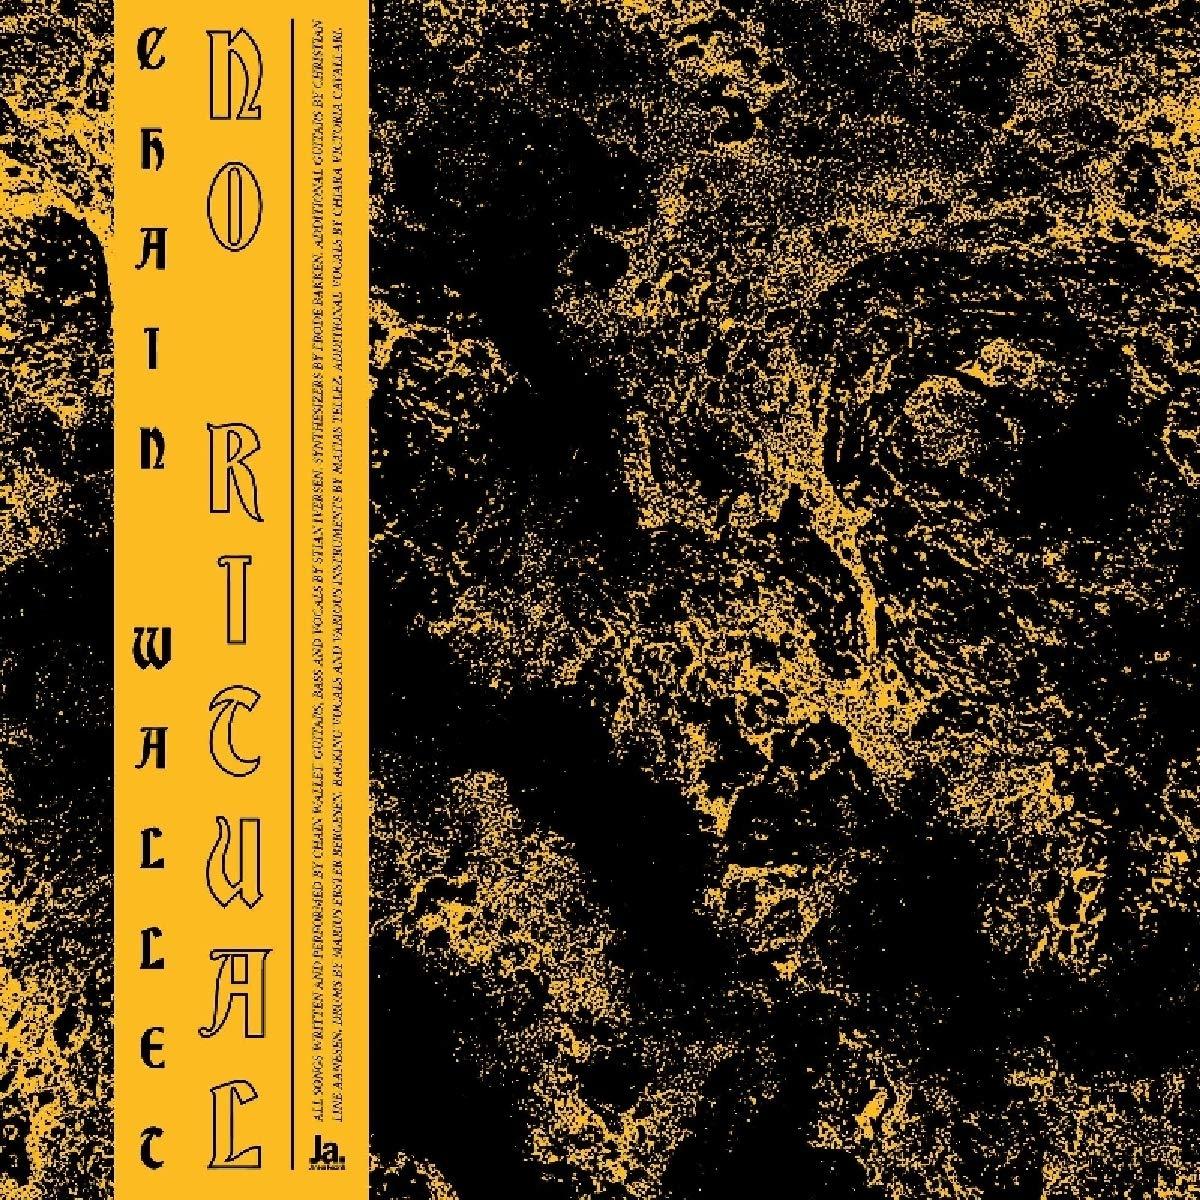 Cassette : Chain Wallet - No Ritual (Cassette)